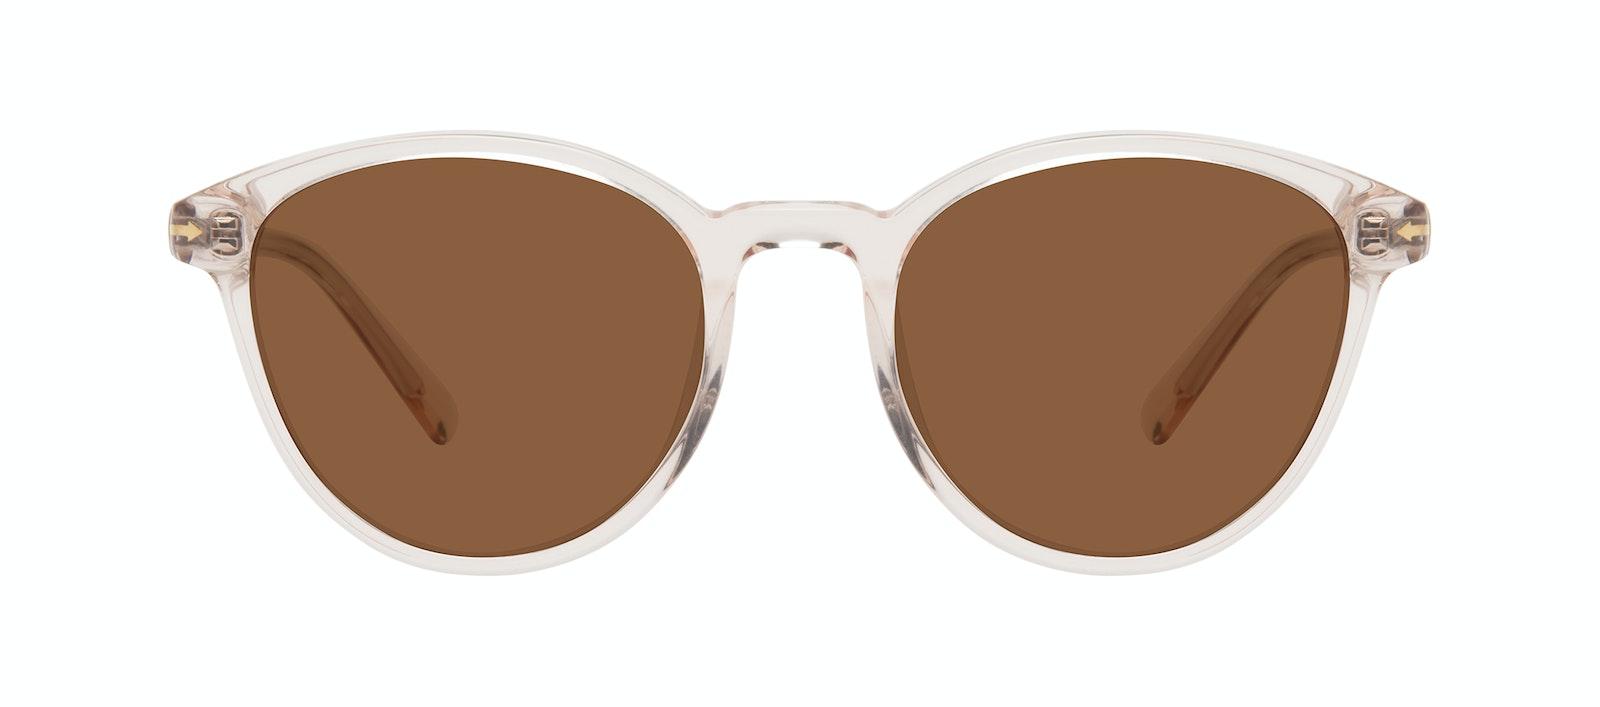 Affordable Fashion Glasses Round Sunglasses Women London Vanilla Front